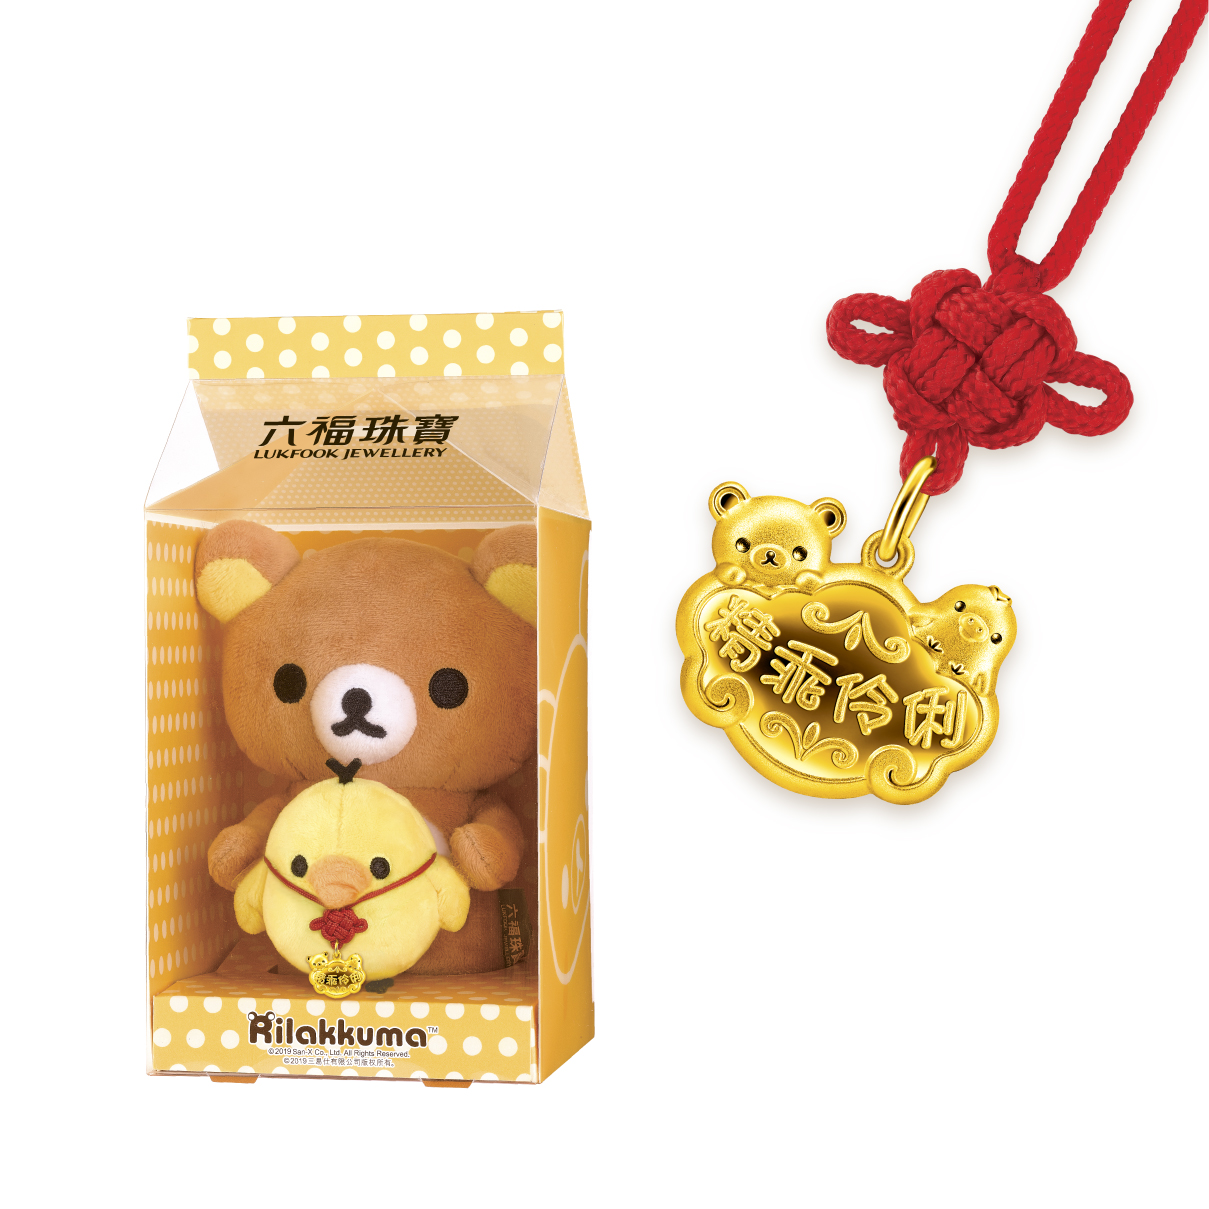 Rilakkuma™ Collection Gold Lock and Cashbox Gift Set